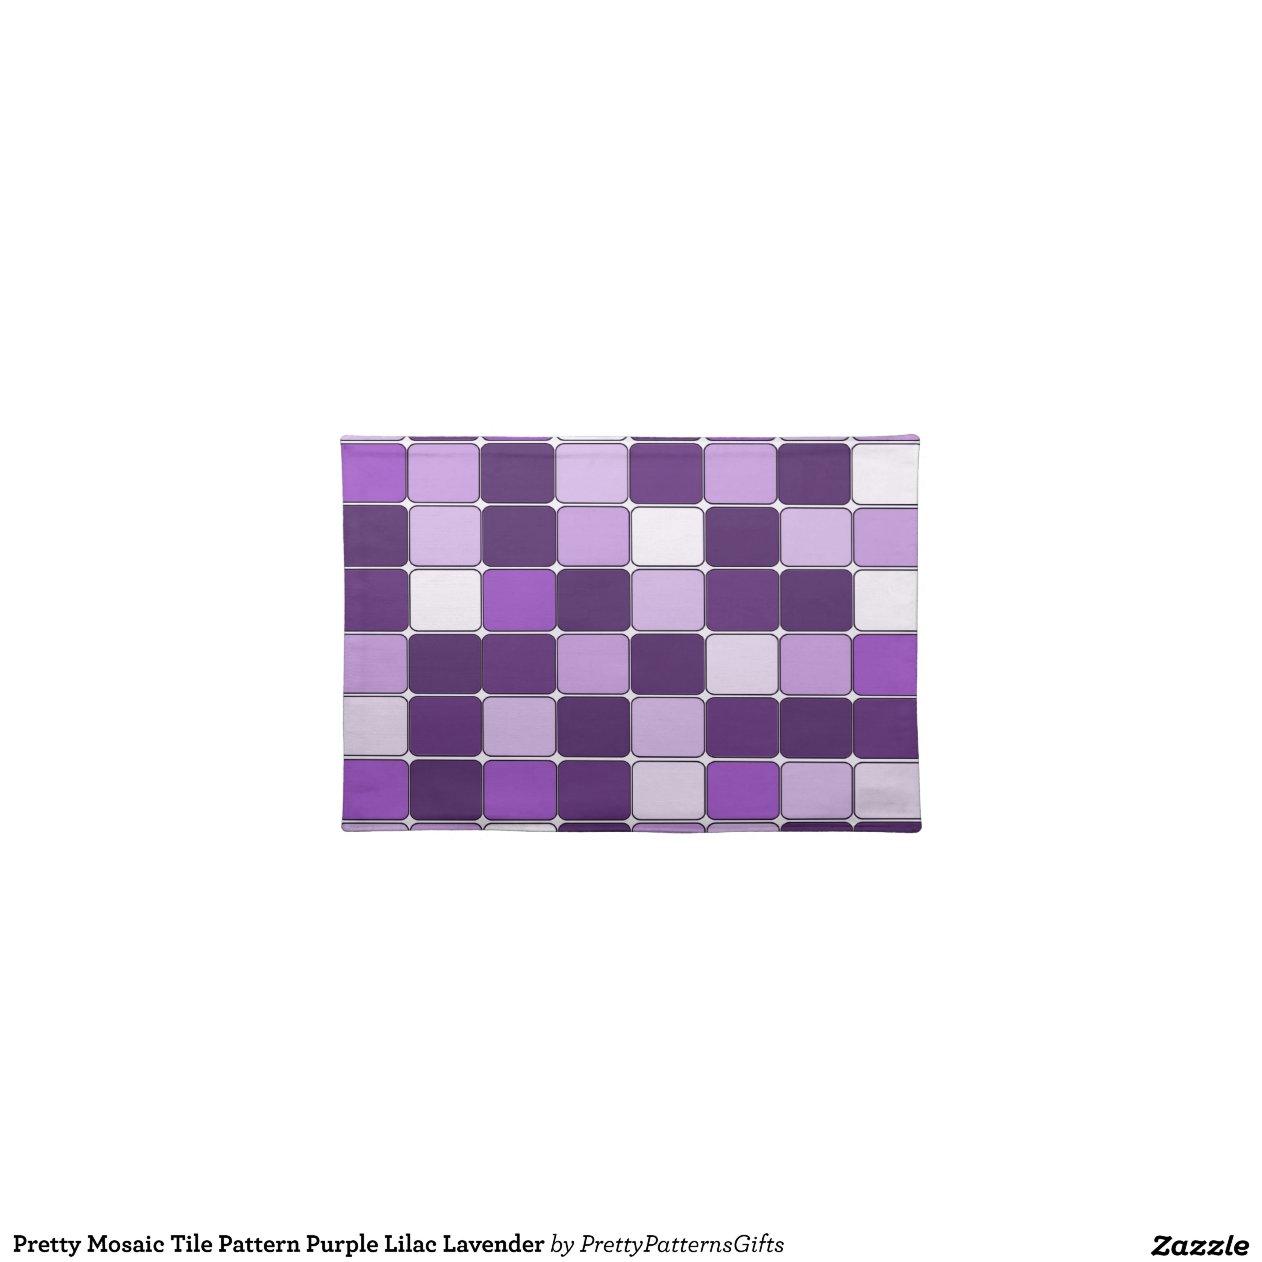 h bsches mosaik fliesen muster lila lila lavendel tischsets zazzle. Black Bedroom Furniture Sets. Home Design Ideas